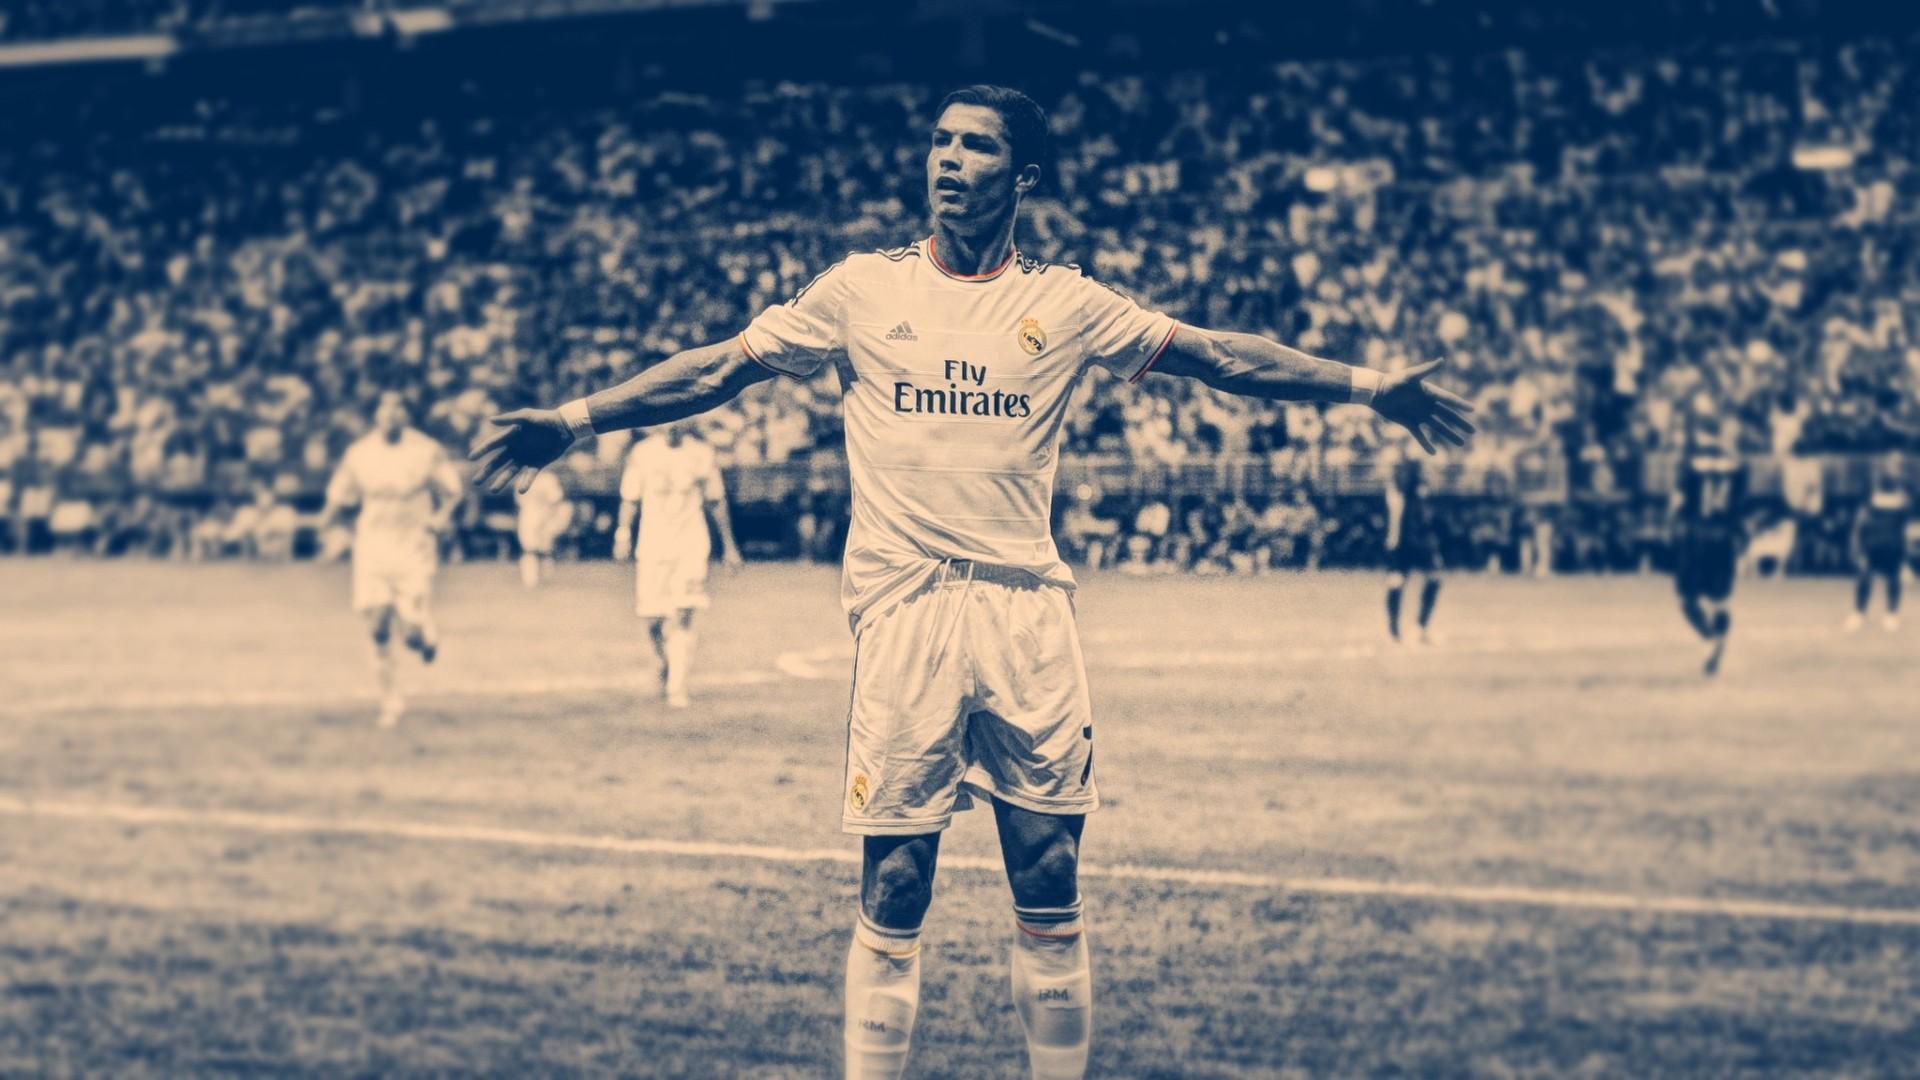 Best Wallpaper Macbook Soccer - men-sport-blue-soccer-spring-Real-Madrid-Cristiano-Ronaldo-photograph-257619  Photograph_682886.jpg